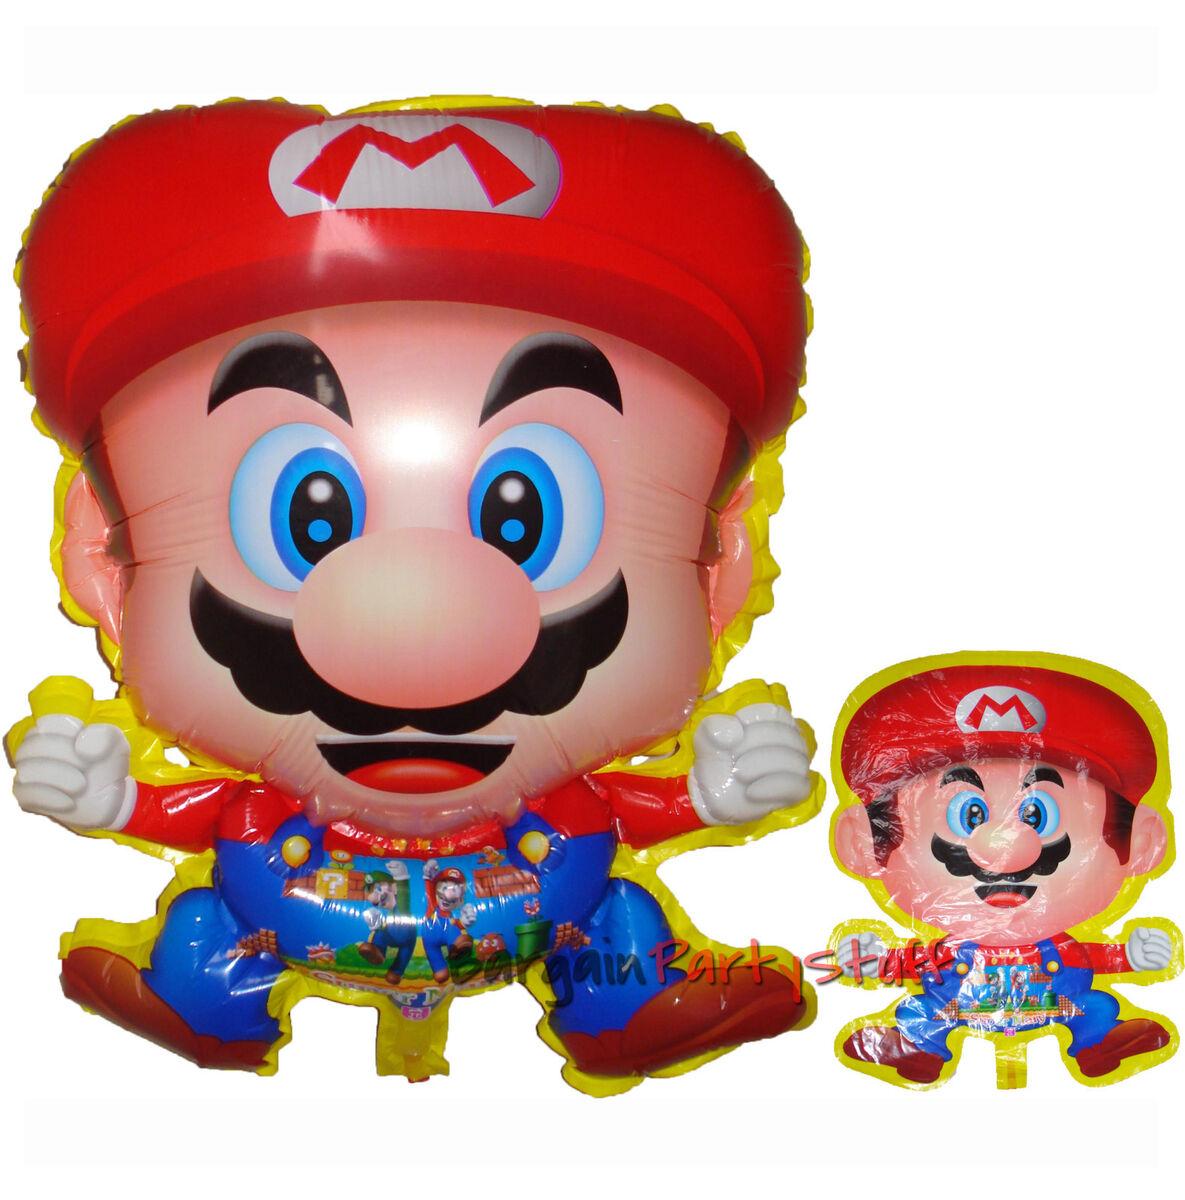 Jumbo Super Mario Bros Birthday Mylar Balloon Party Supplies 3 Peices